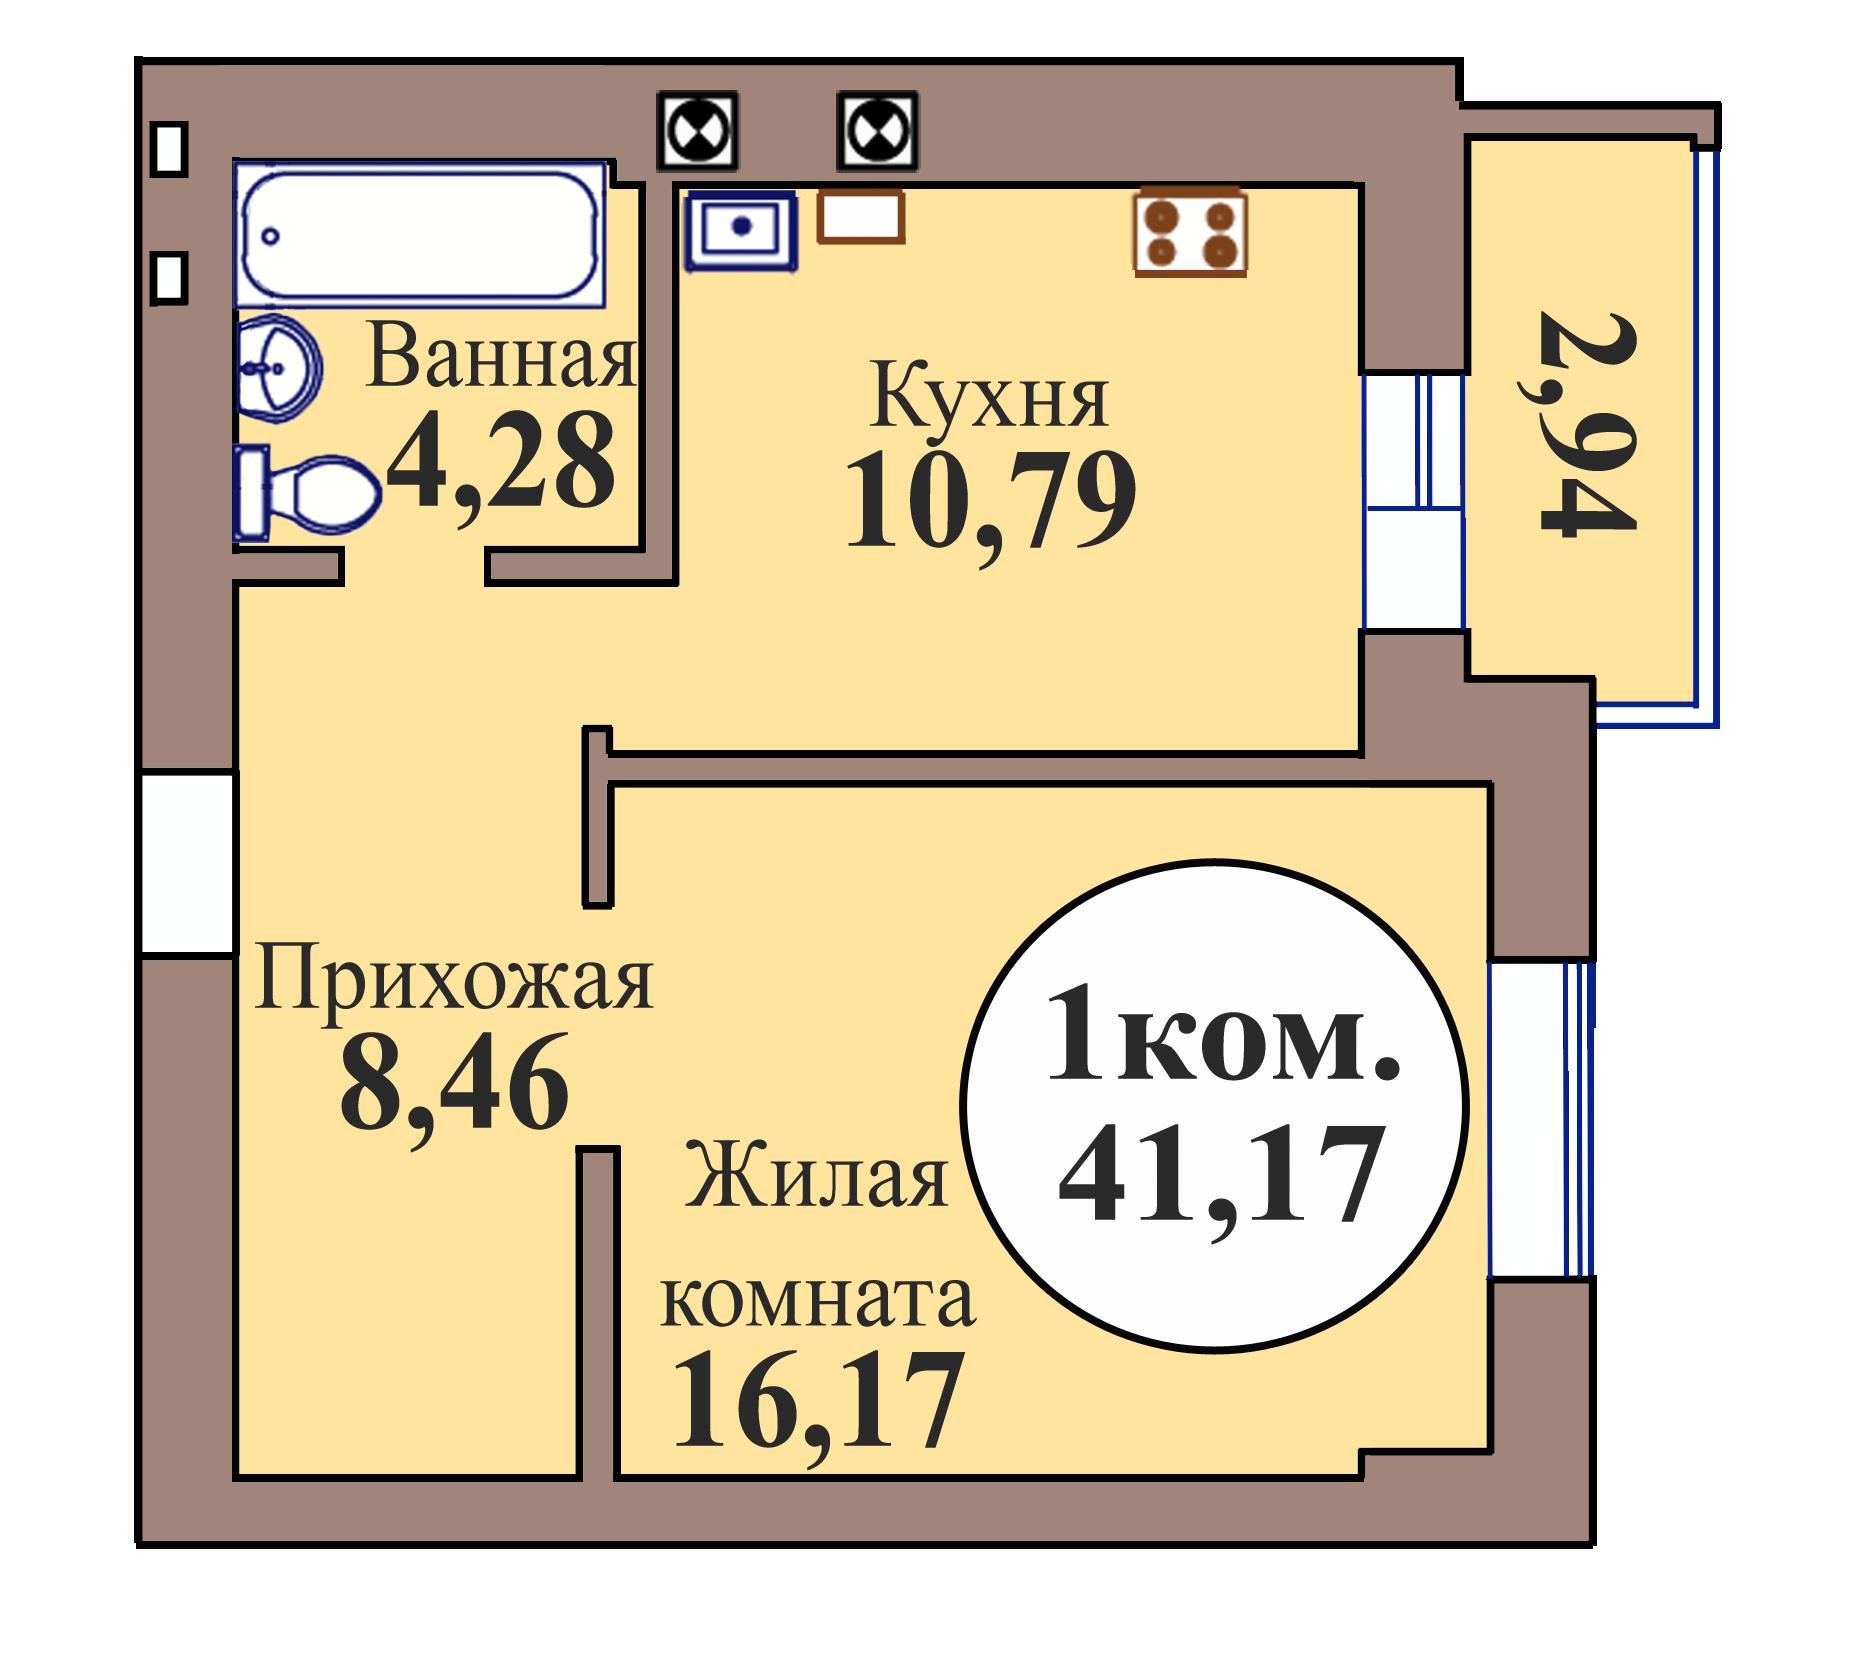 1-комн. кв. по ГП дом №3, МКР Васильково, кв. 124 в Калининграде